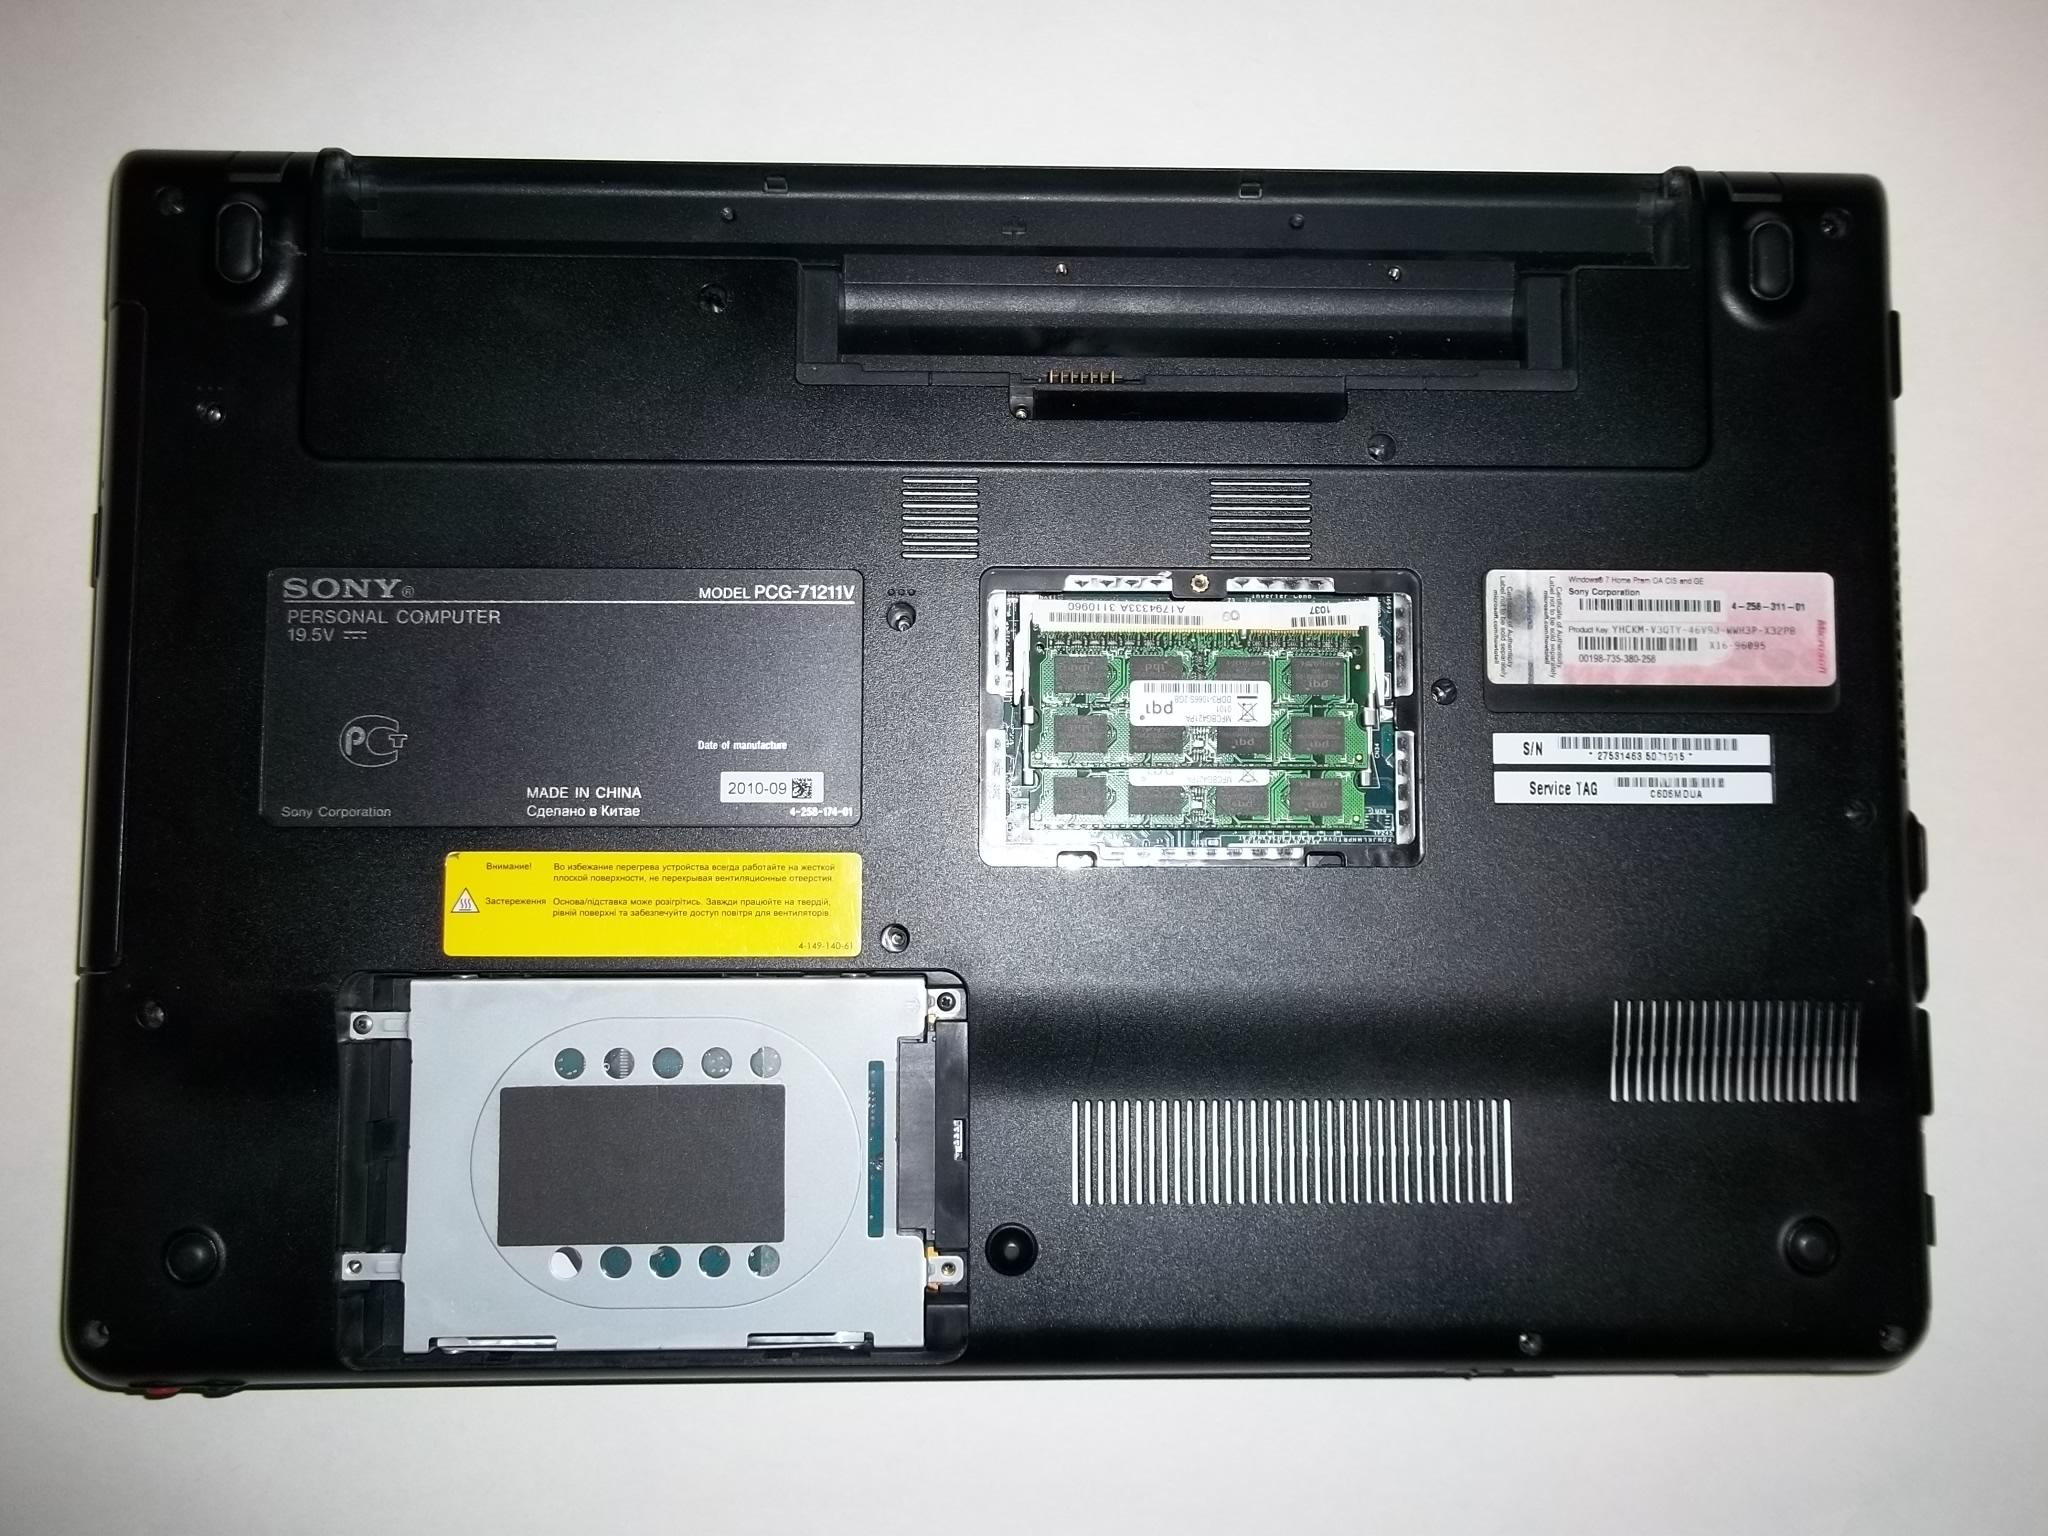 самоделка ноутбук вентилятор на юсб схема